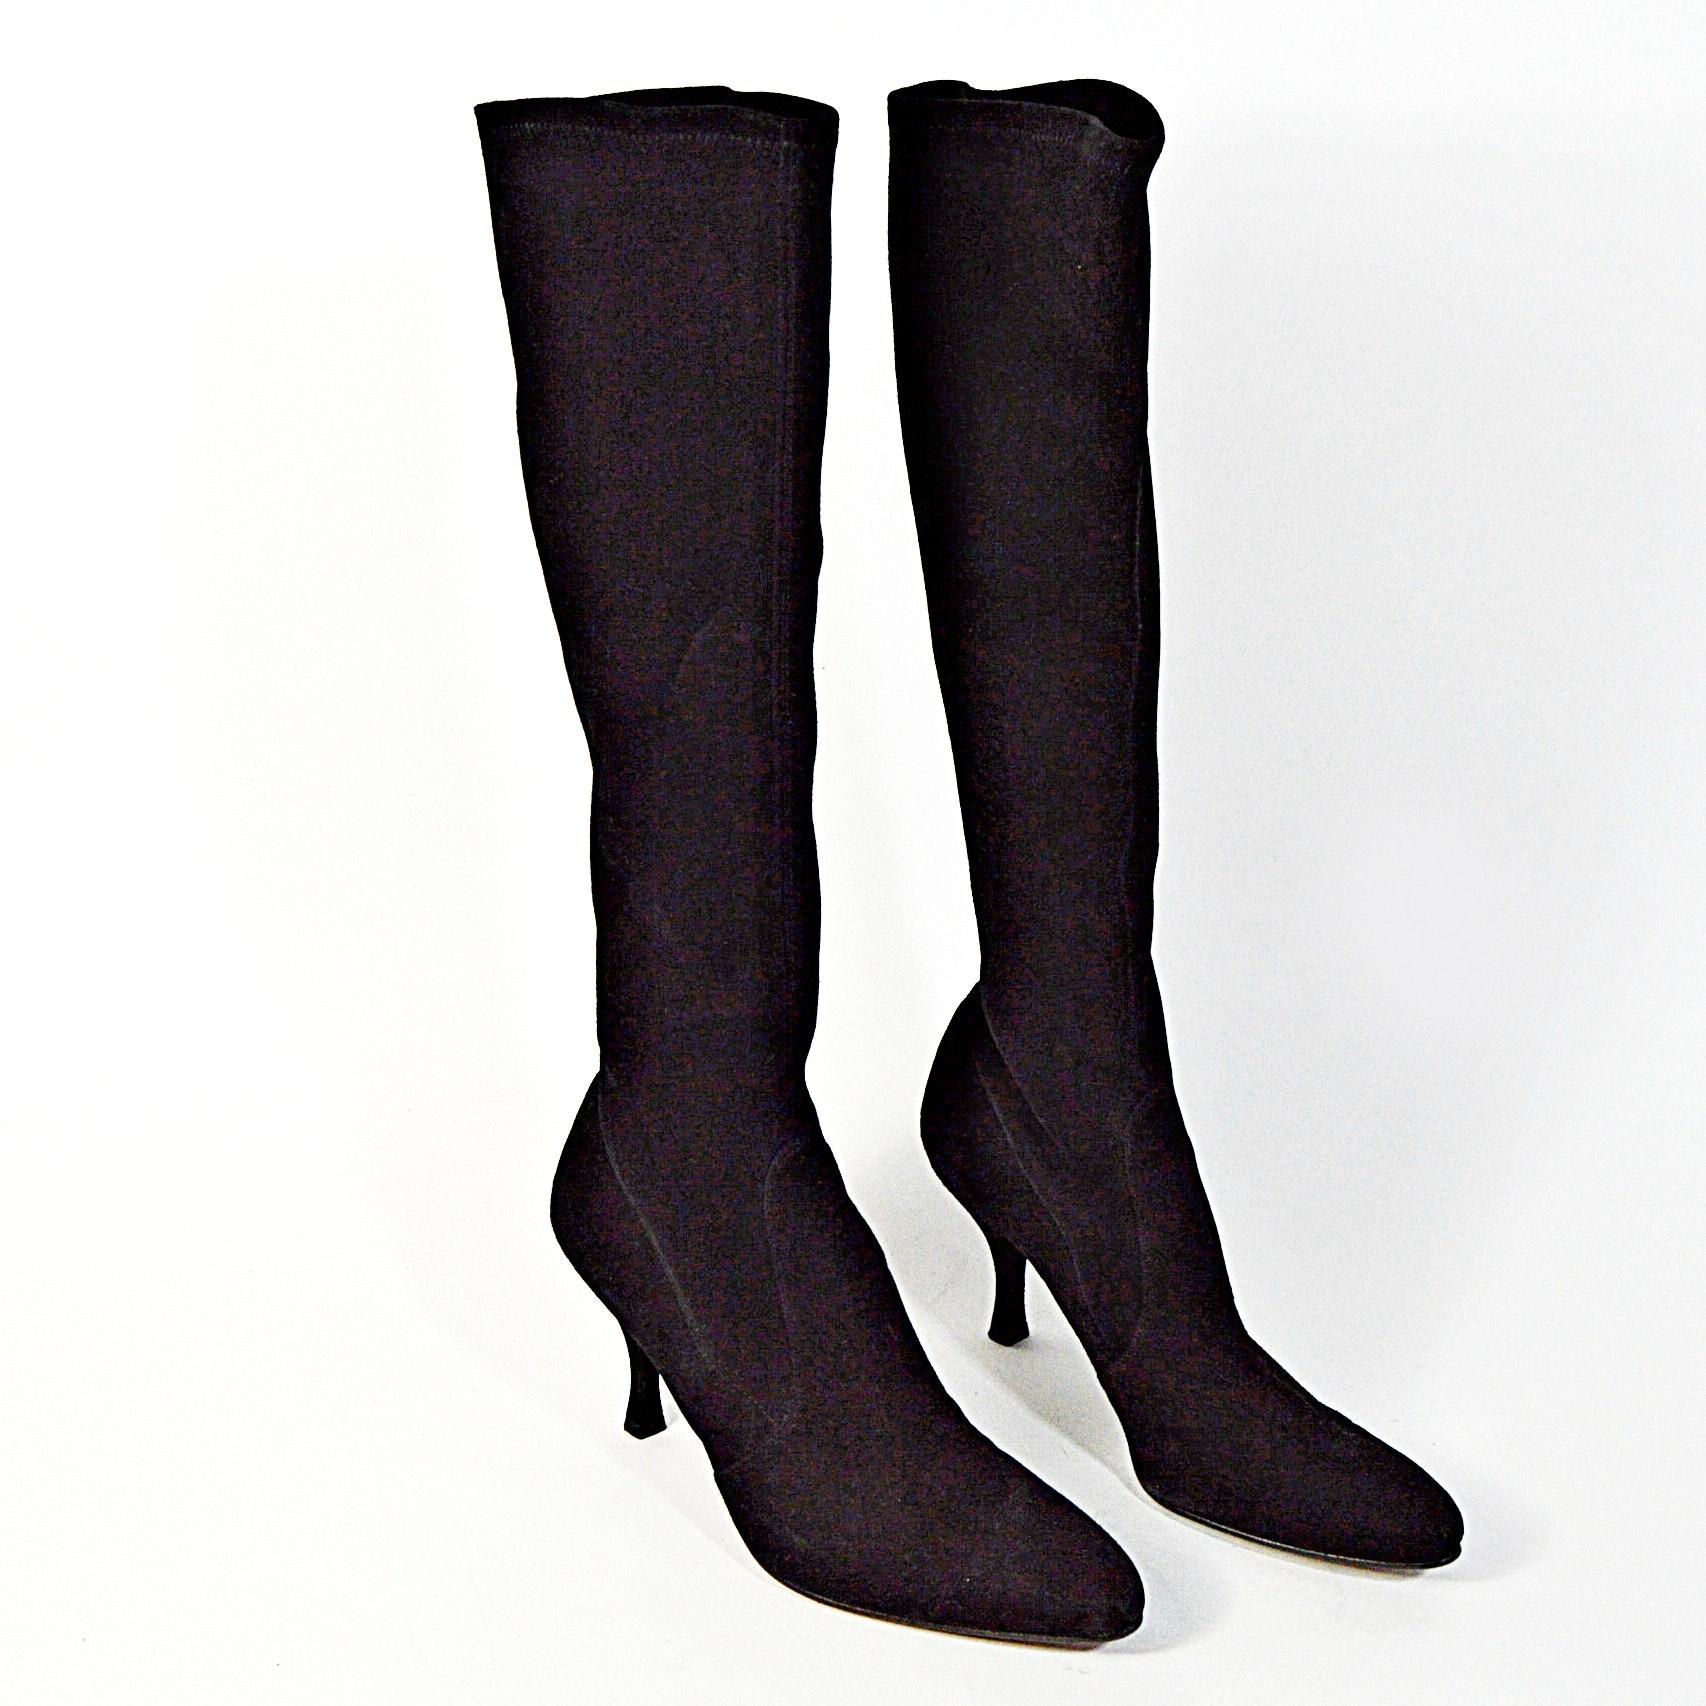 Stuart Weitzman Black Suede Boots, 8.5M